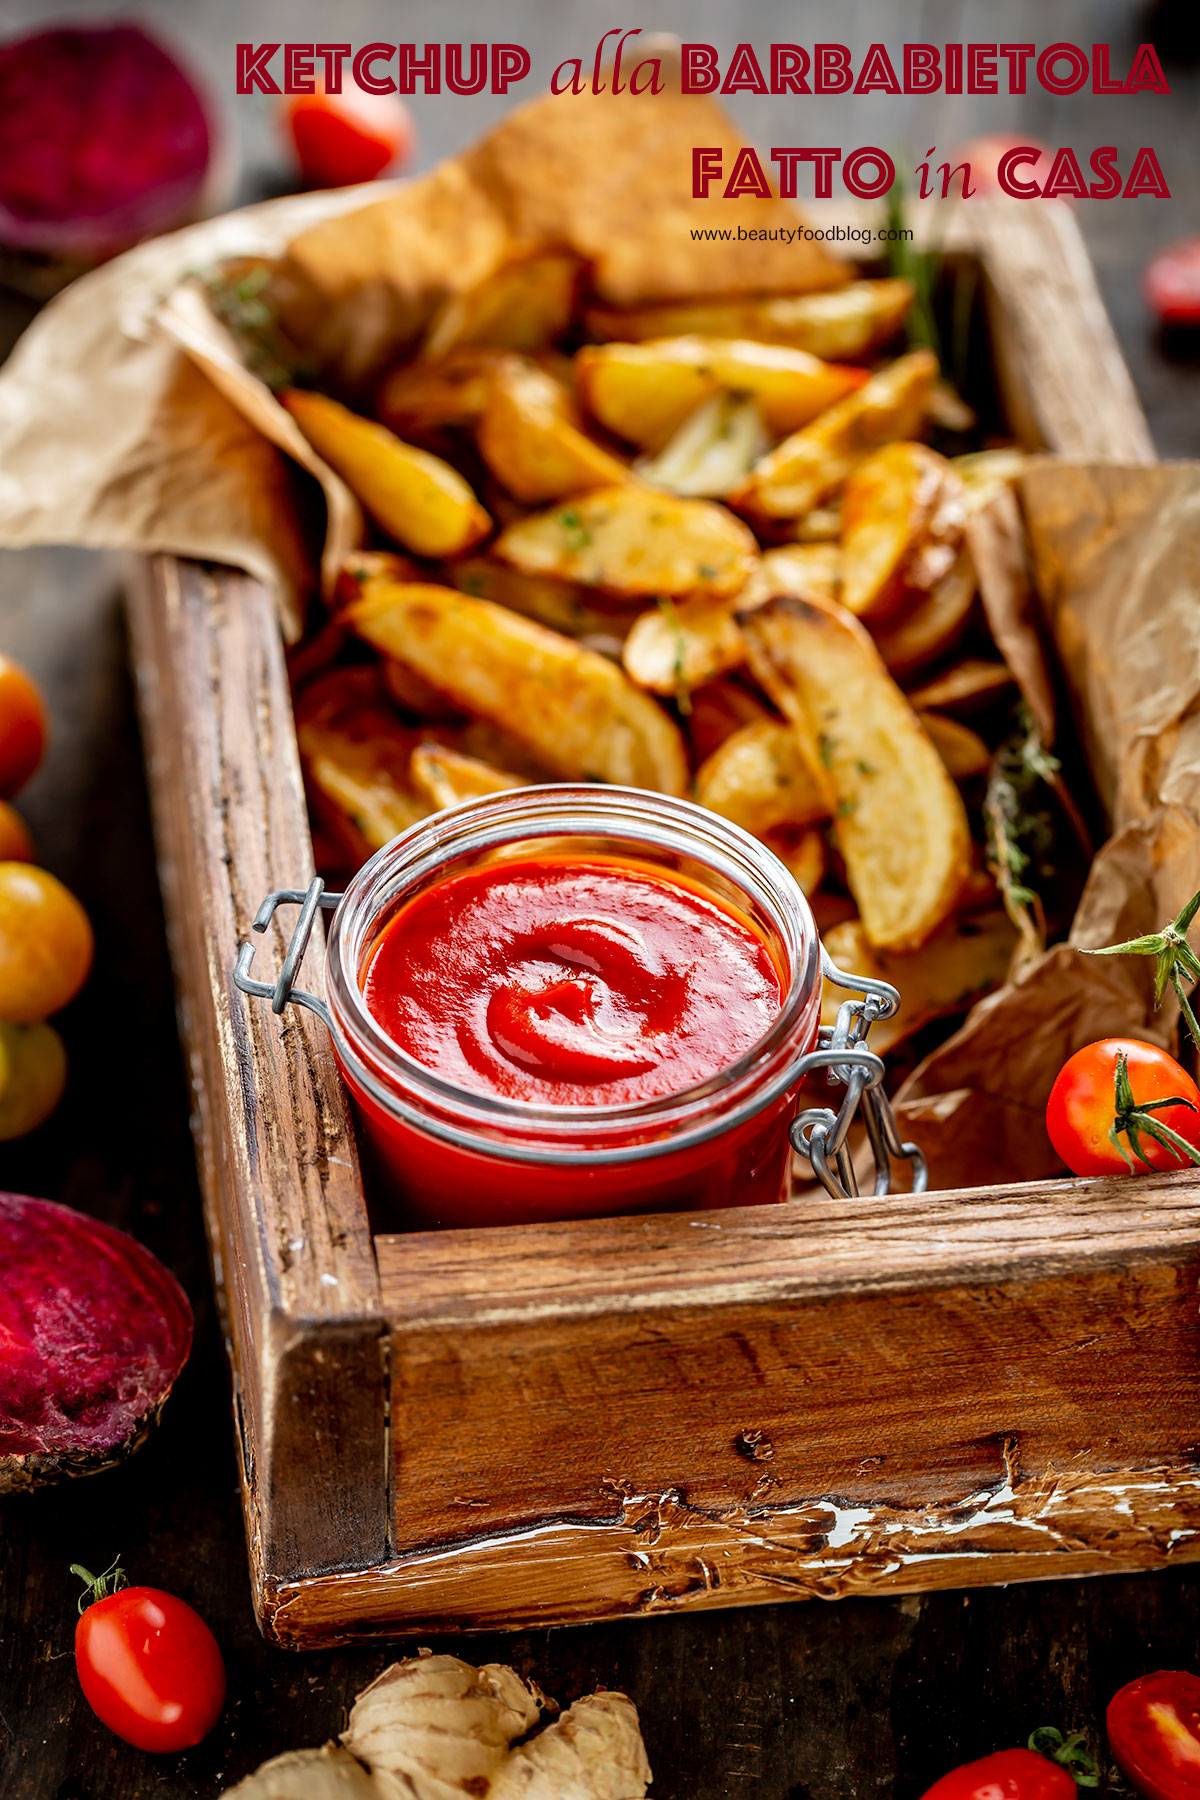 ricetta KETCHUP fatto in casa alla BARBABIETOLA Vegan senza glutine senza zucchero raffinato VEGAN homemade tomato BEET ketchup recipe refined sugar free #healthy beautyfoodblog